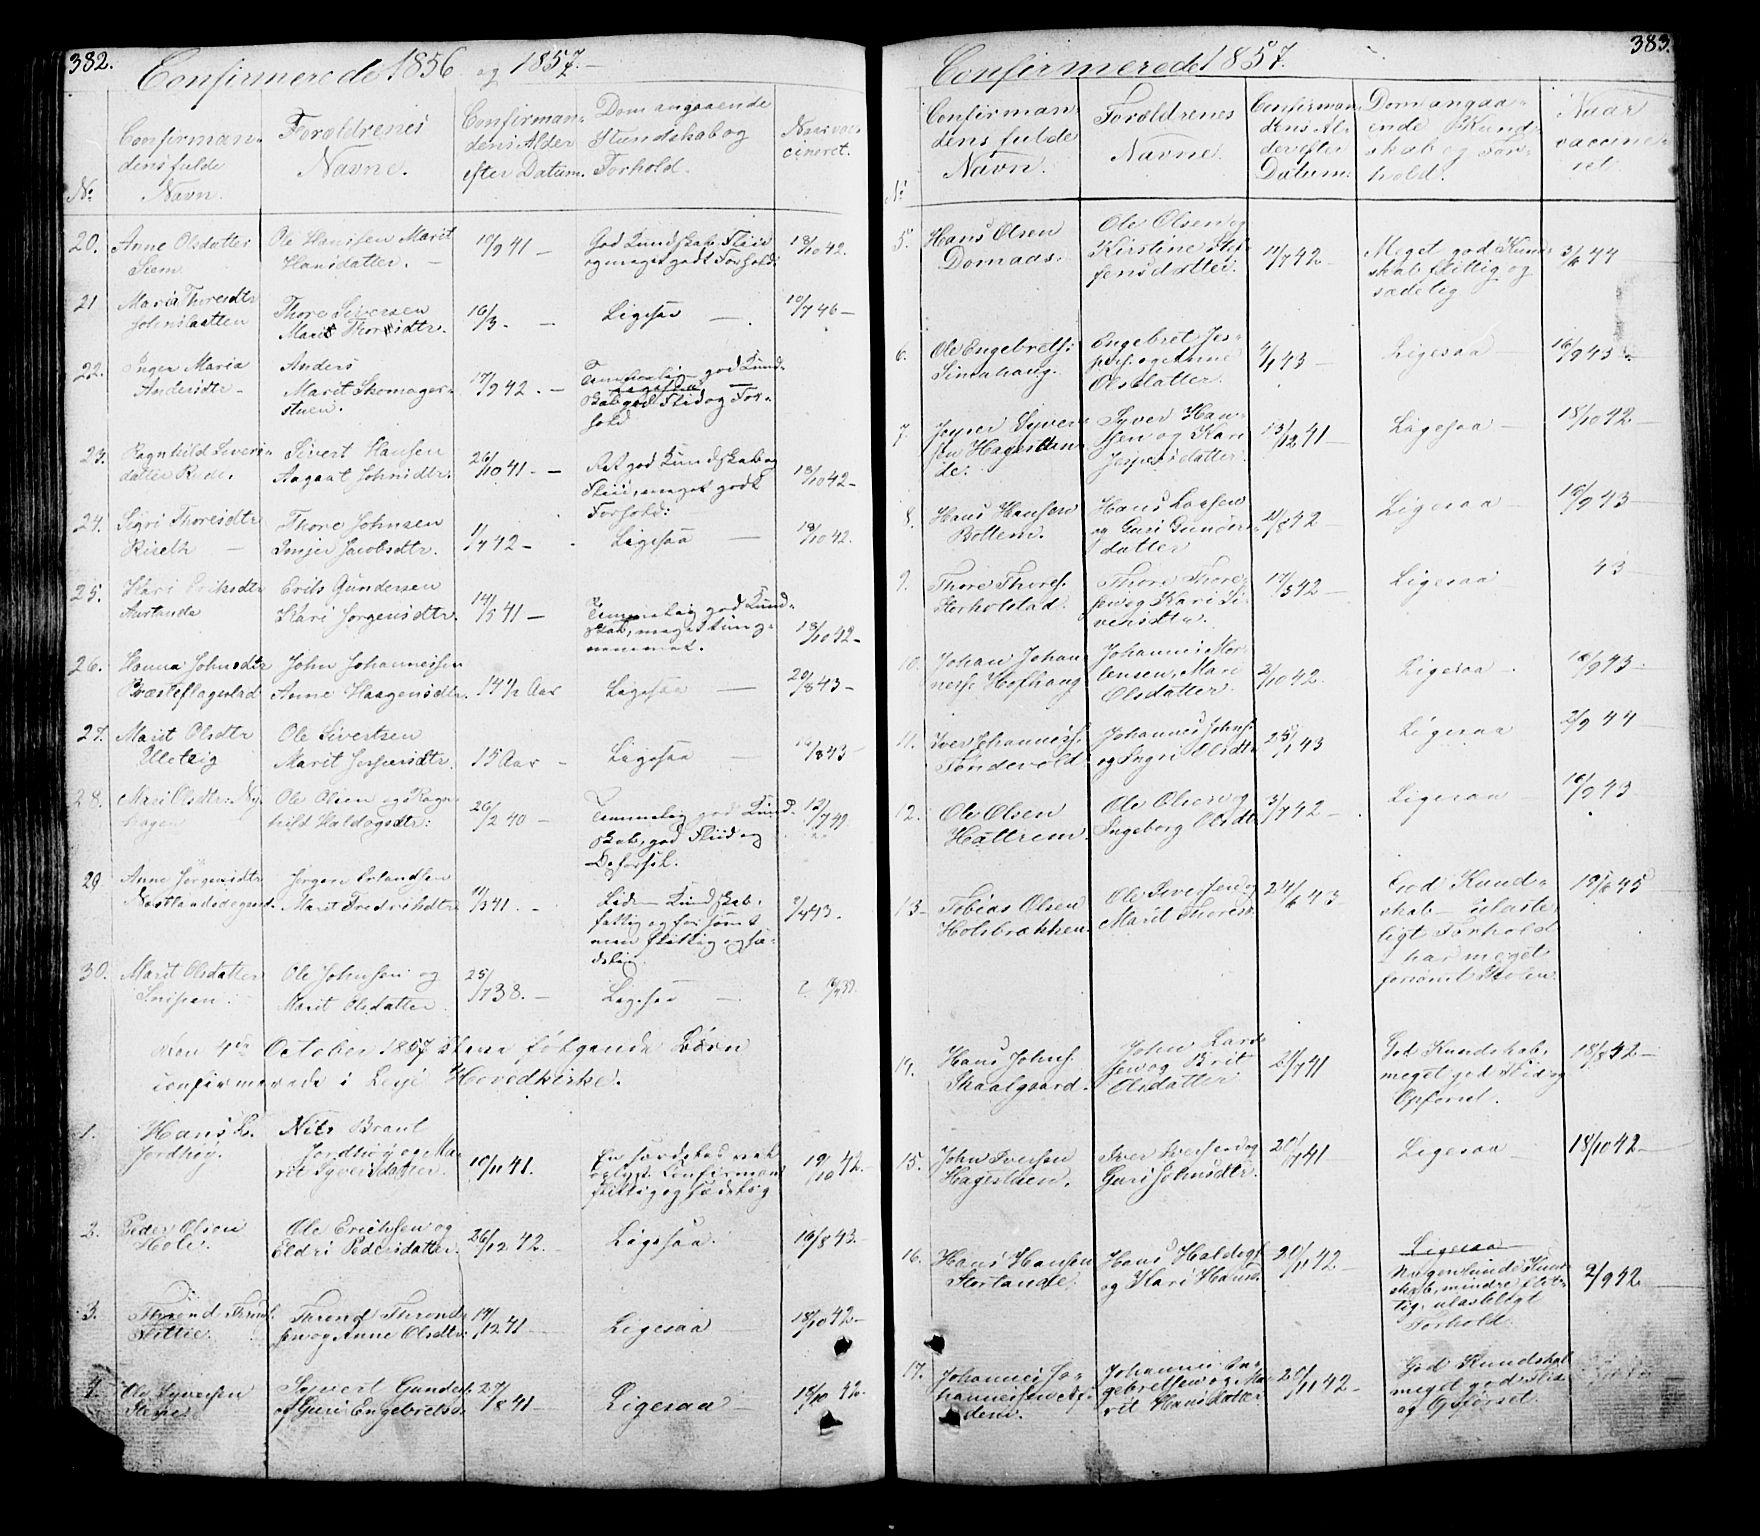 SAH, Lesja prestekontor, Klokkerbok nr. 5, 1850-1894, s. 382-383